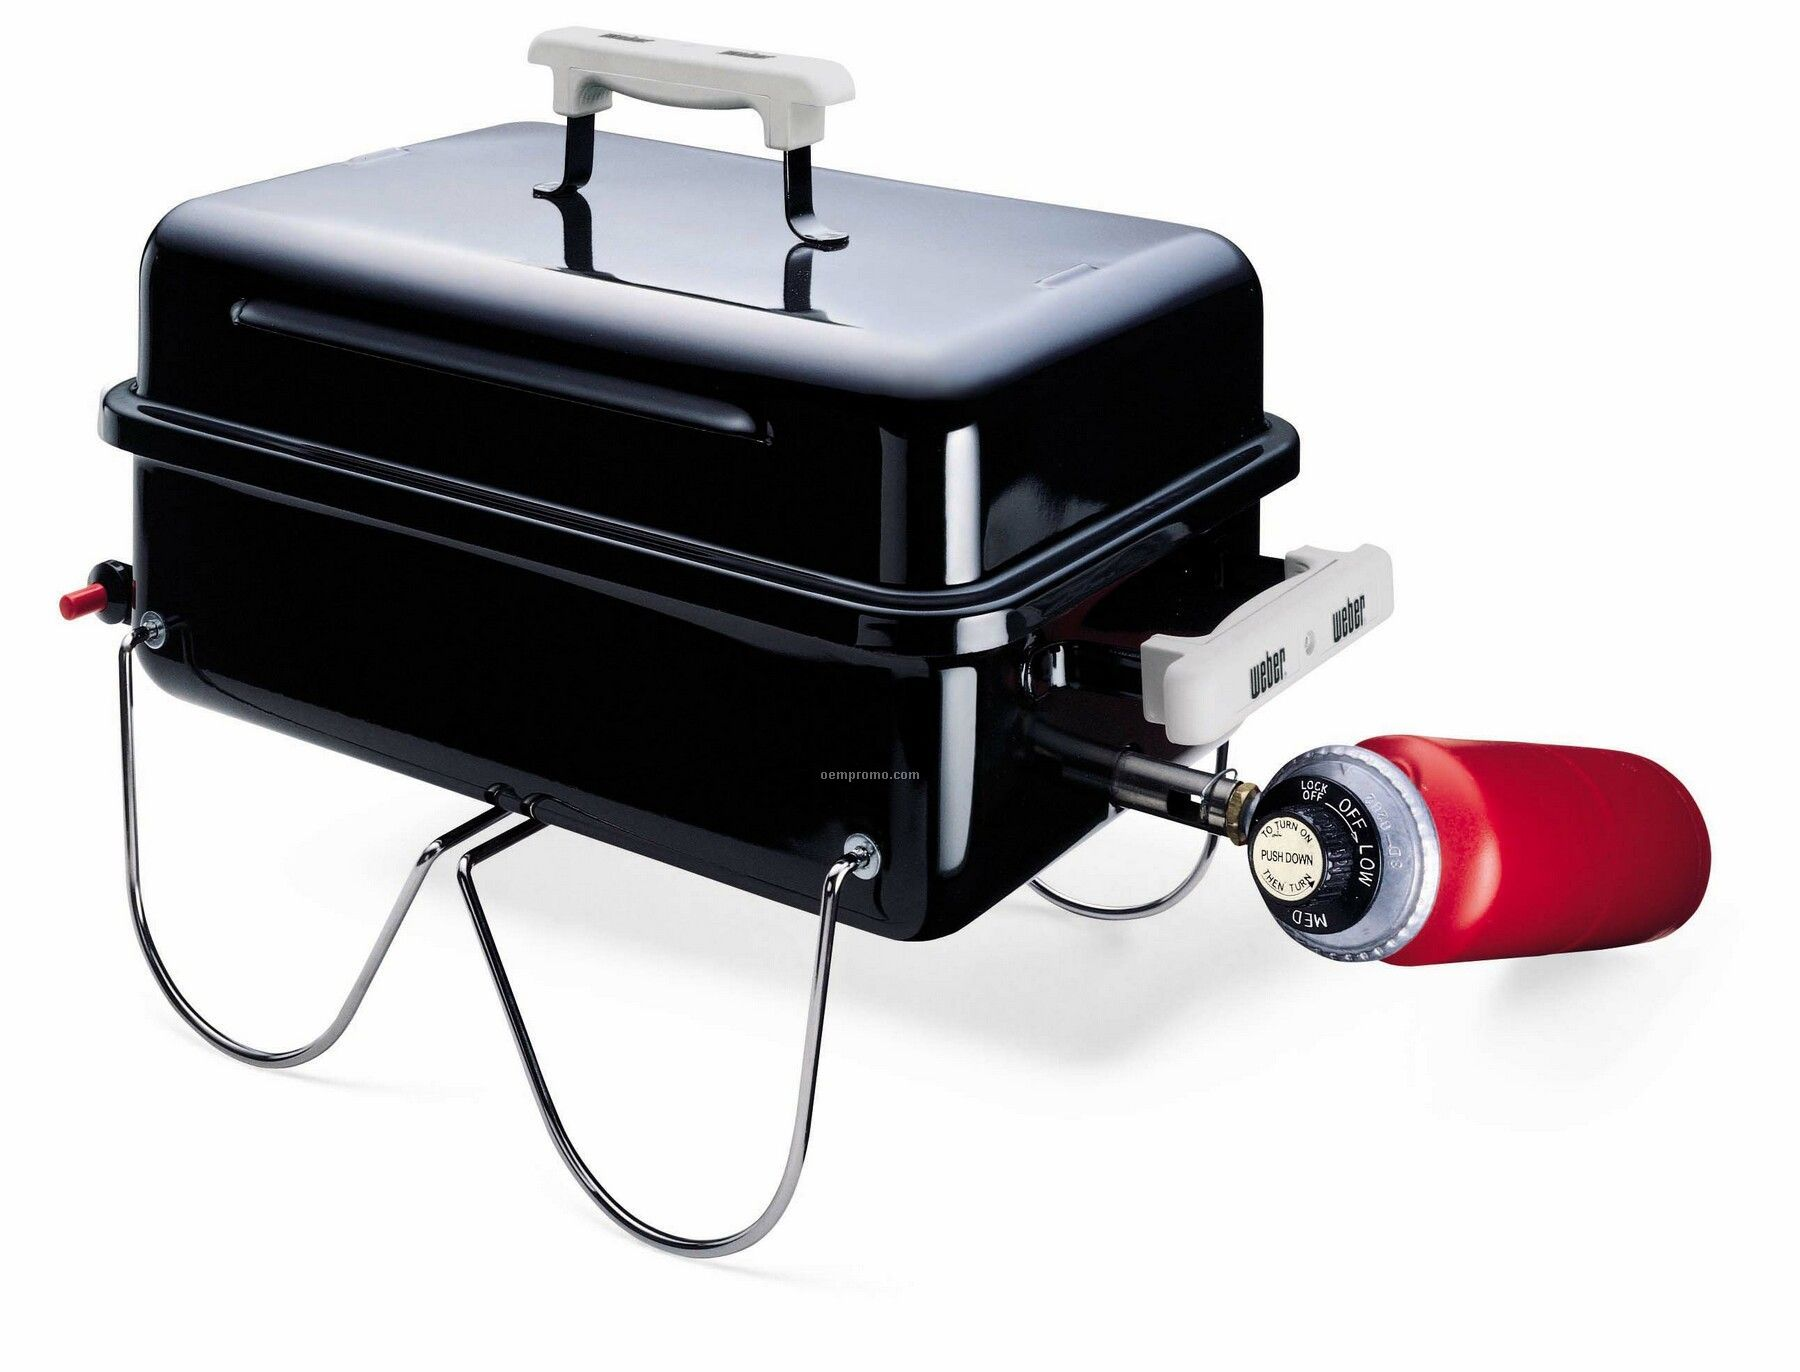 Weber Gas Go-anywhere Grill